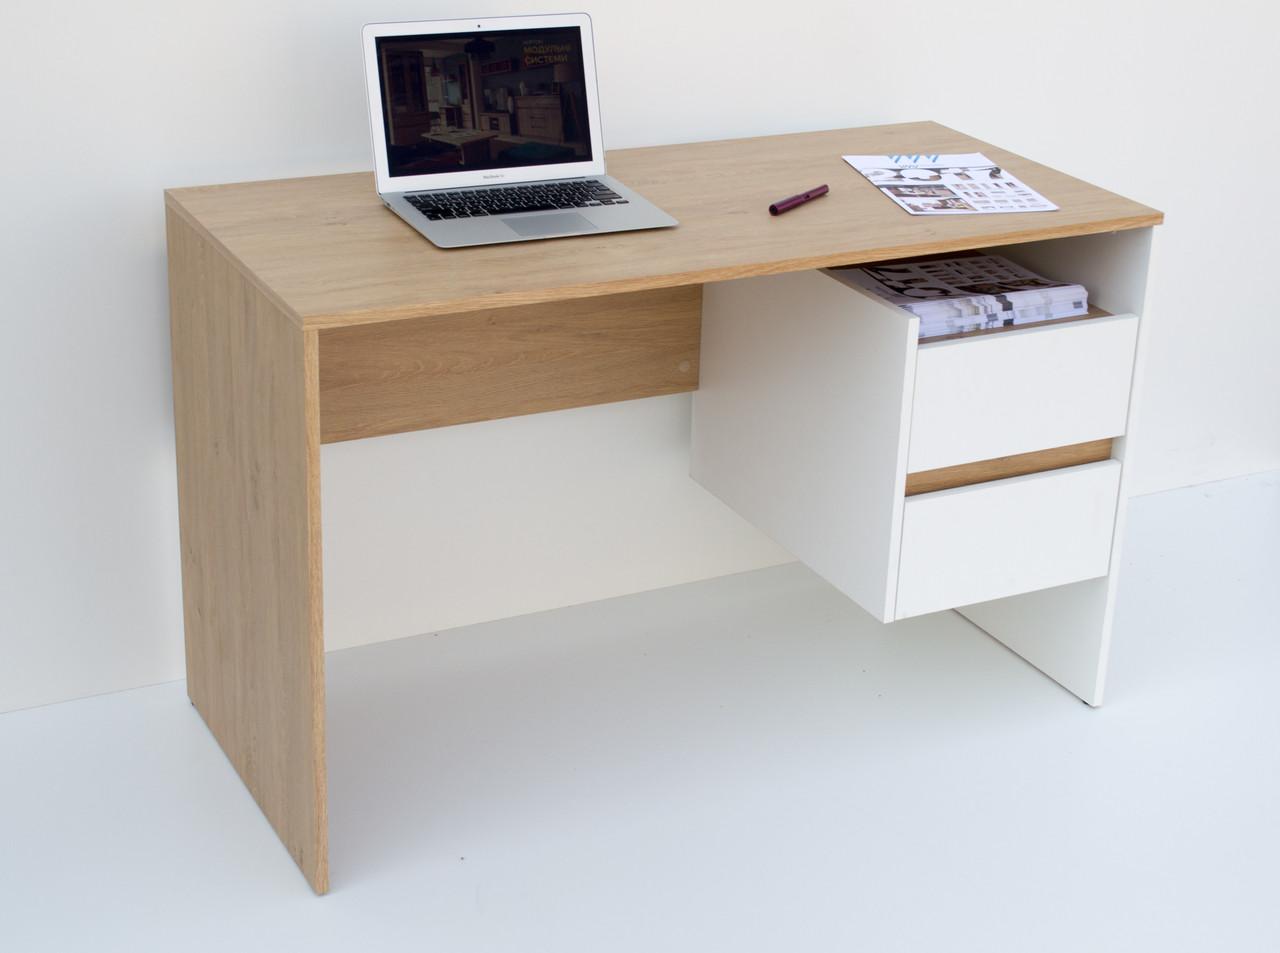 Компьютерный стол ВМВ Холдинг HO2S